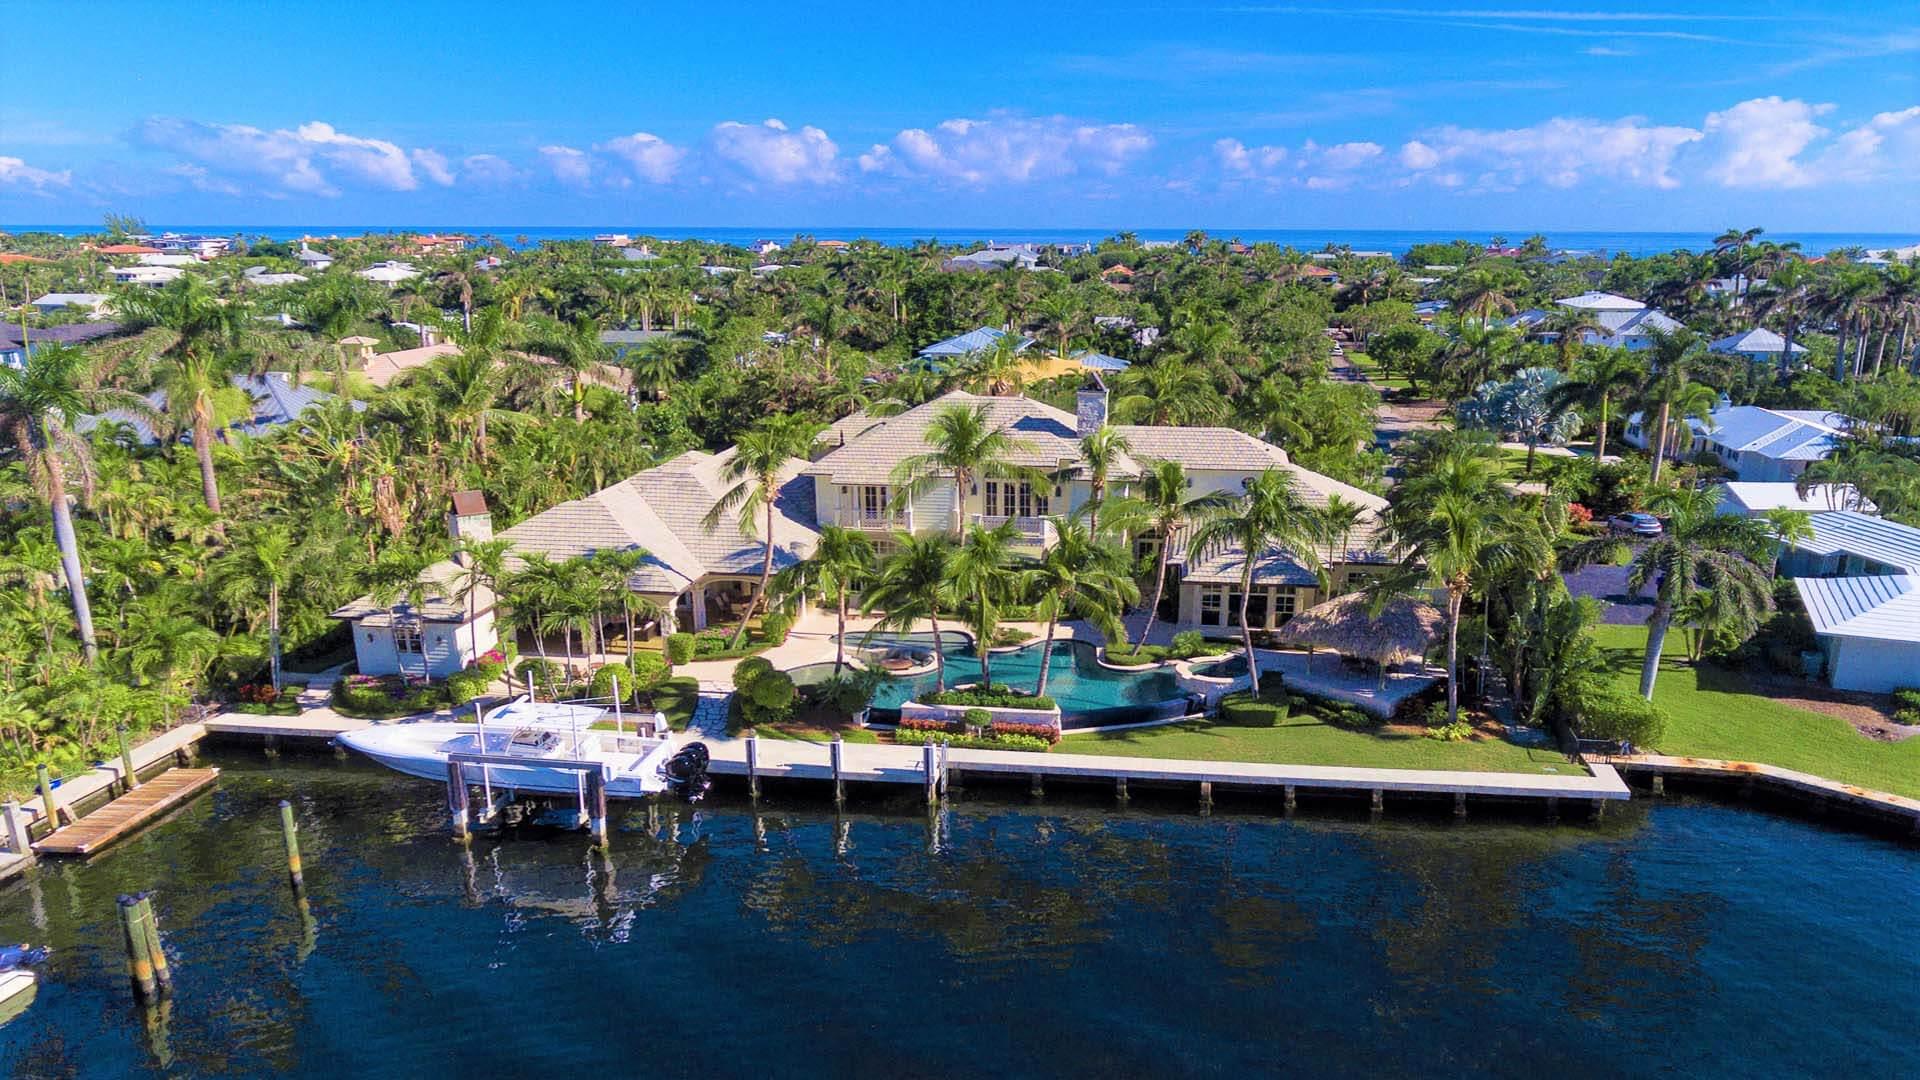 Waterfront Resort-Style Residence is East Delray Beach's Best Kept Secret